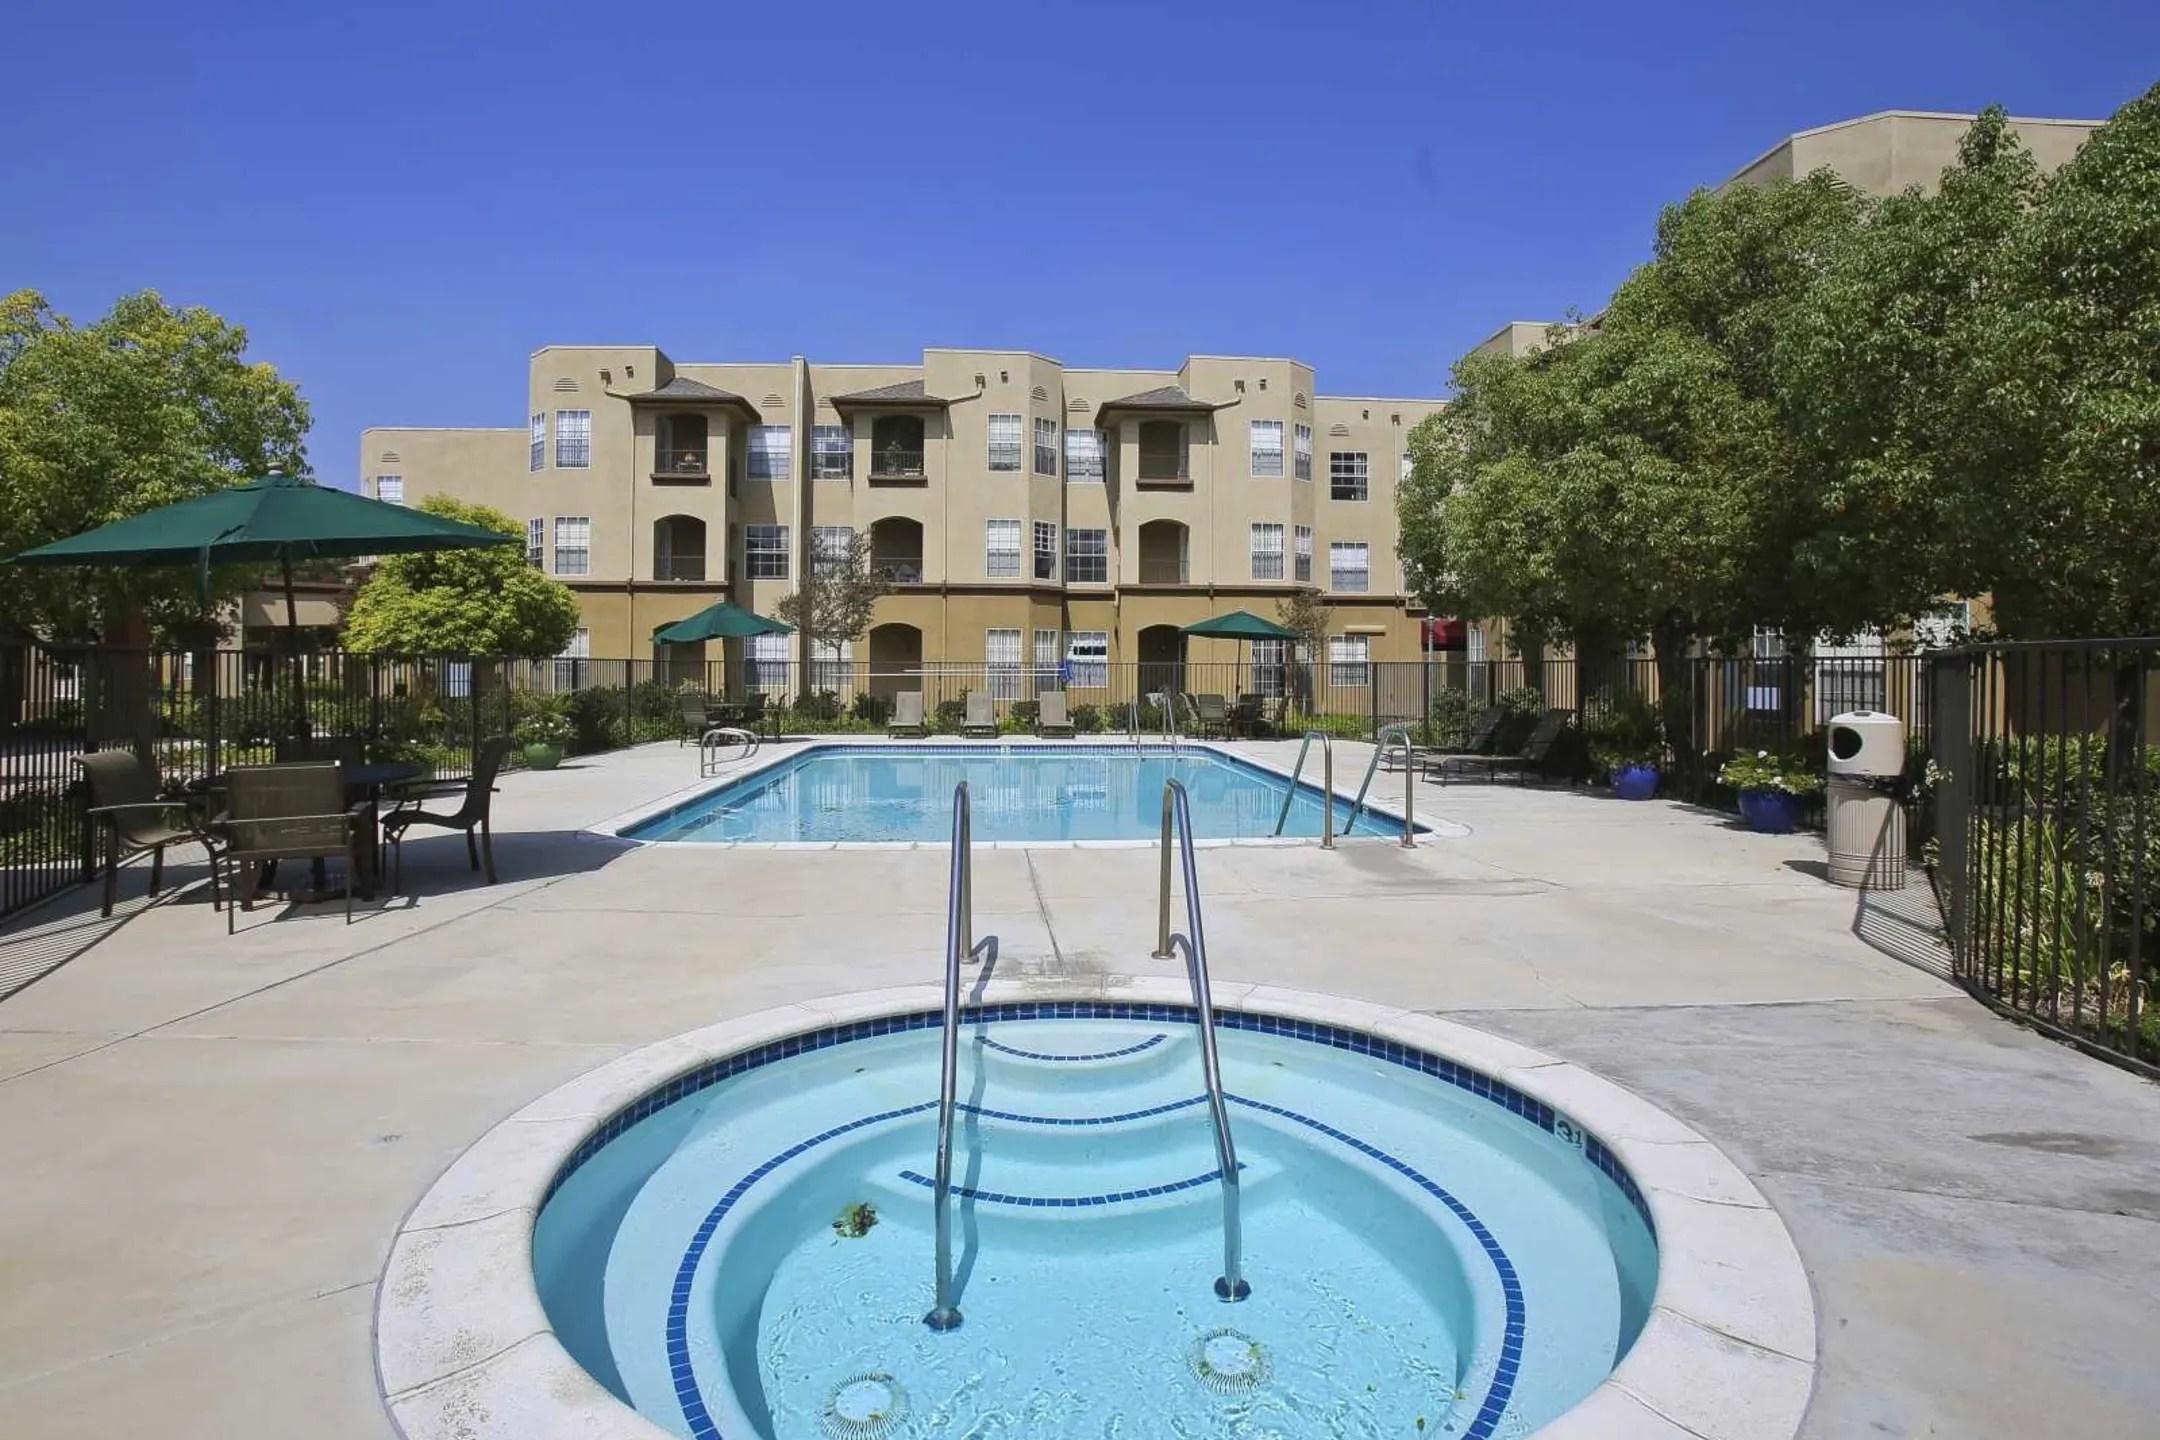 Bouquet Canyon Senior Apartments  Santa Clarita CA 91350